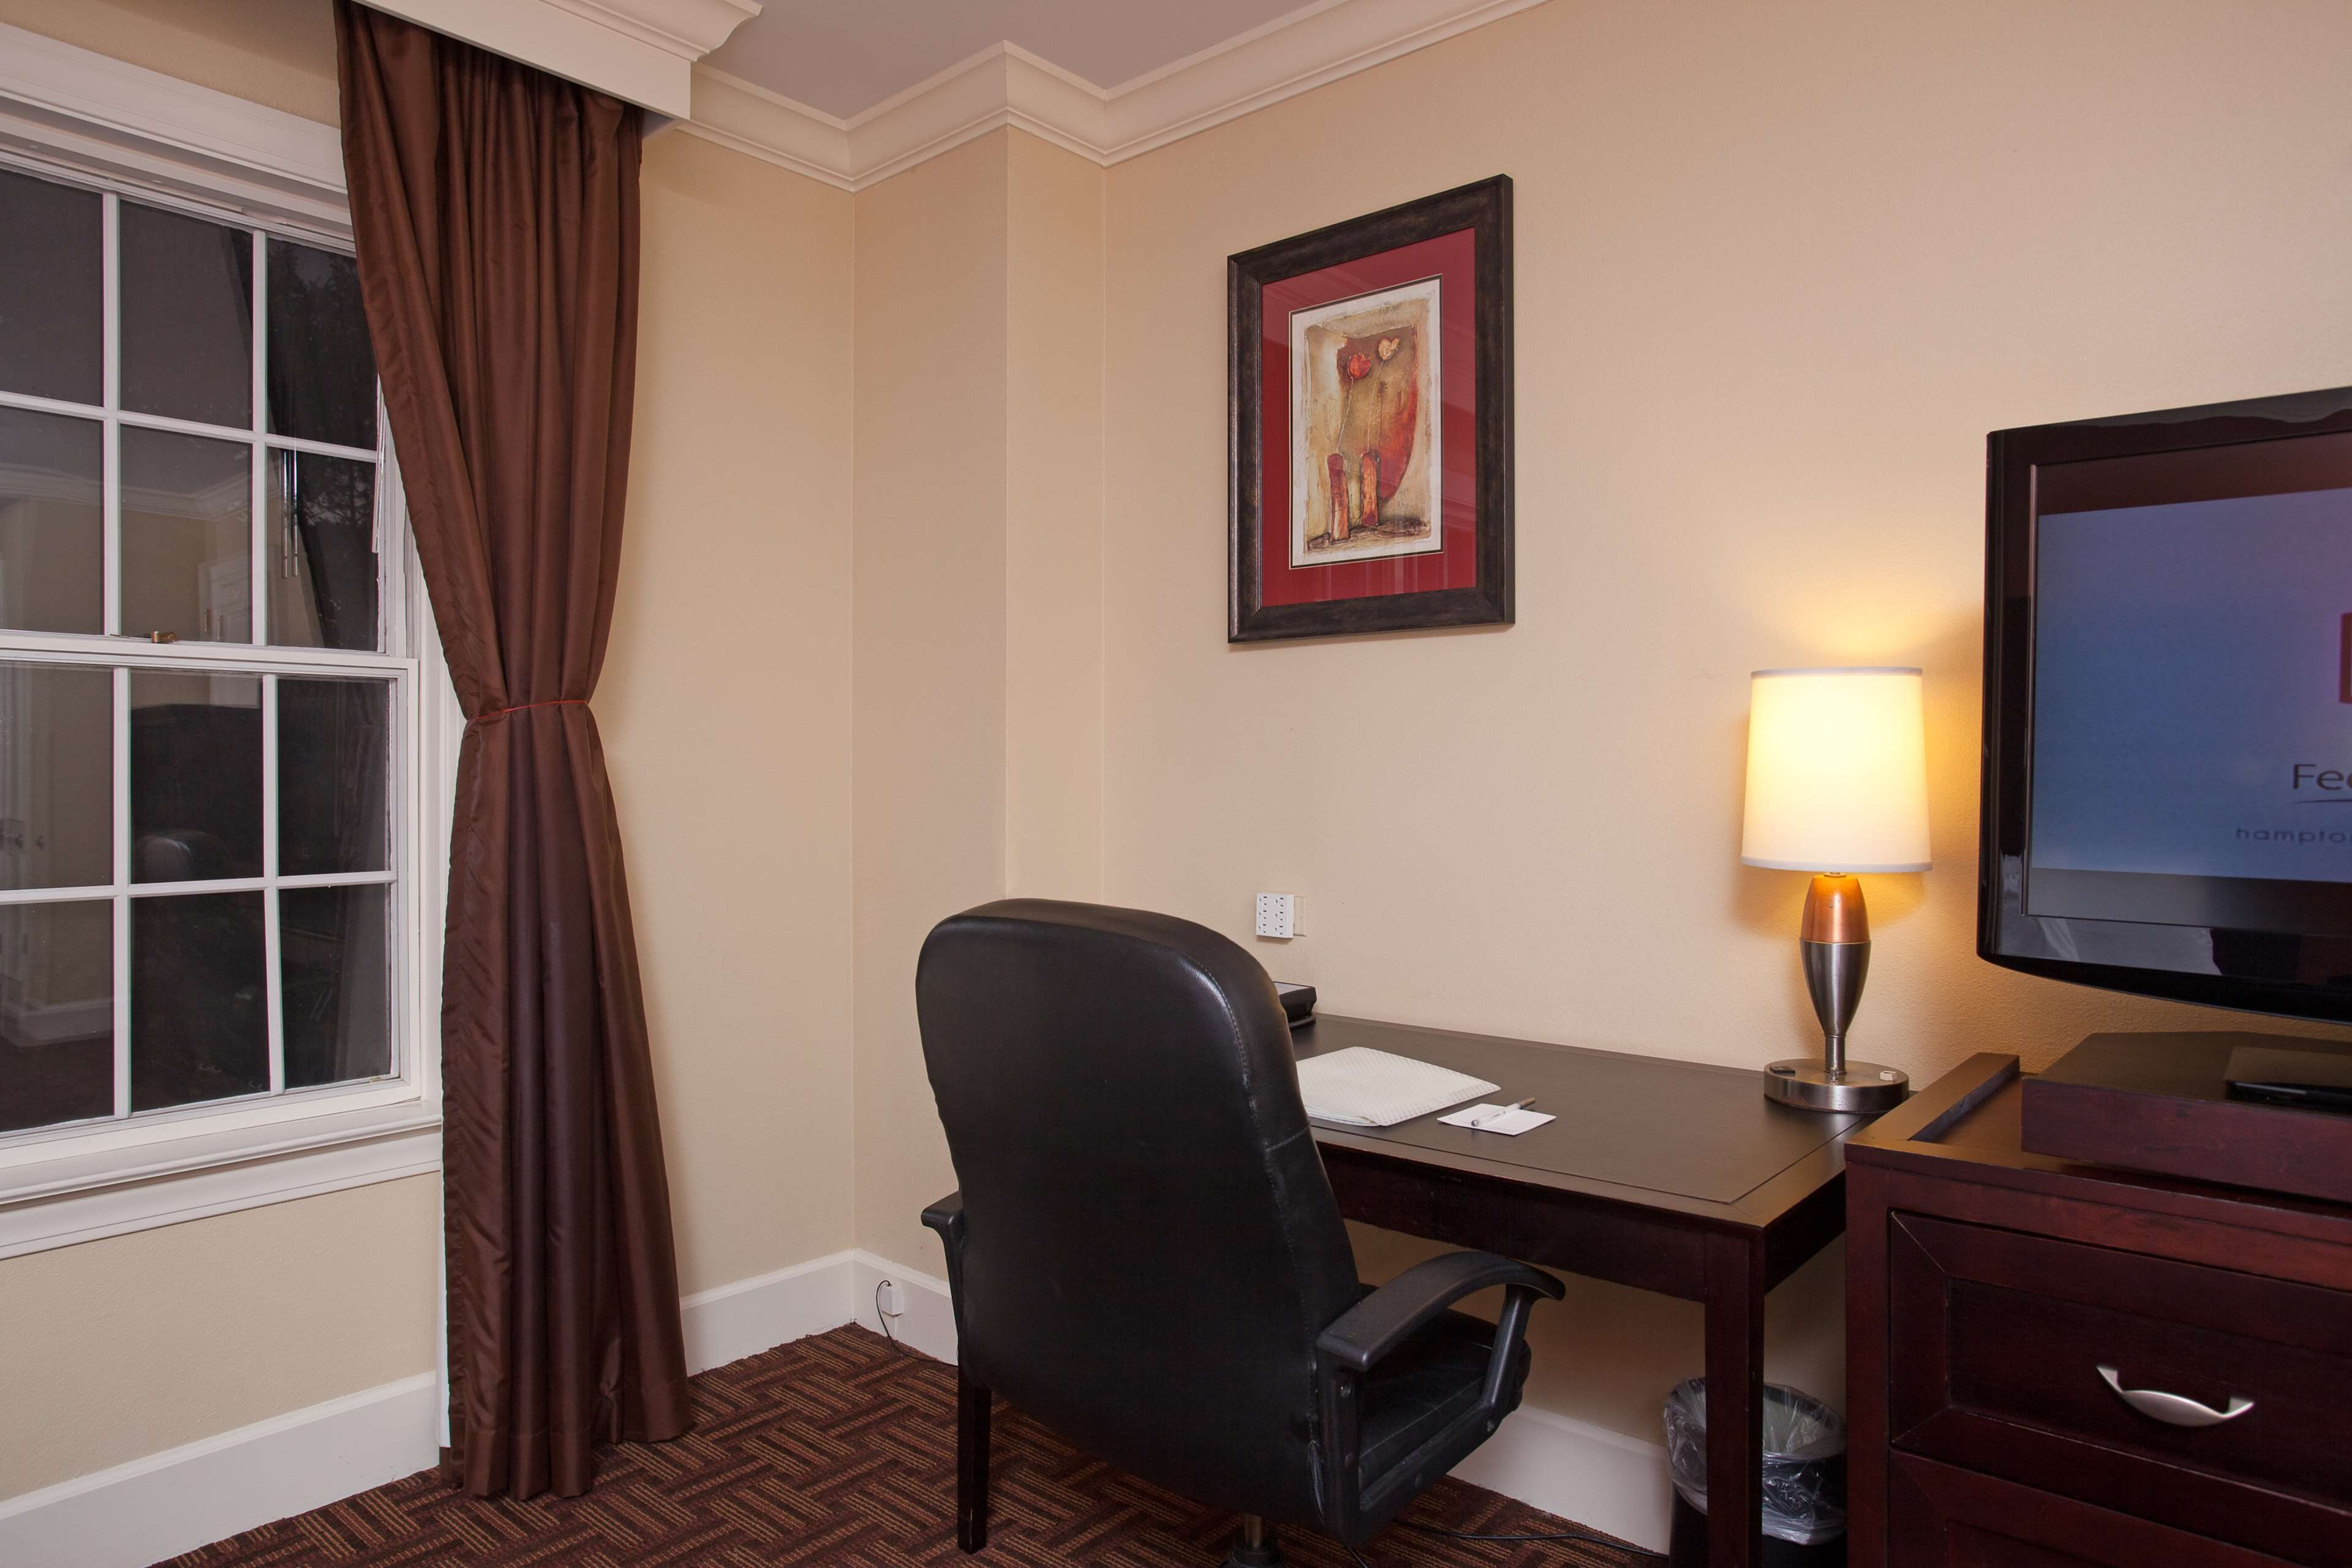 Hampton Inn & Suites Stamford image 29